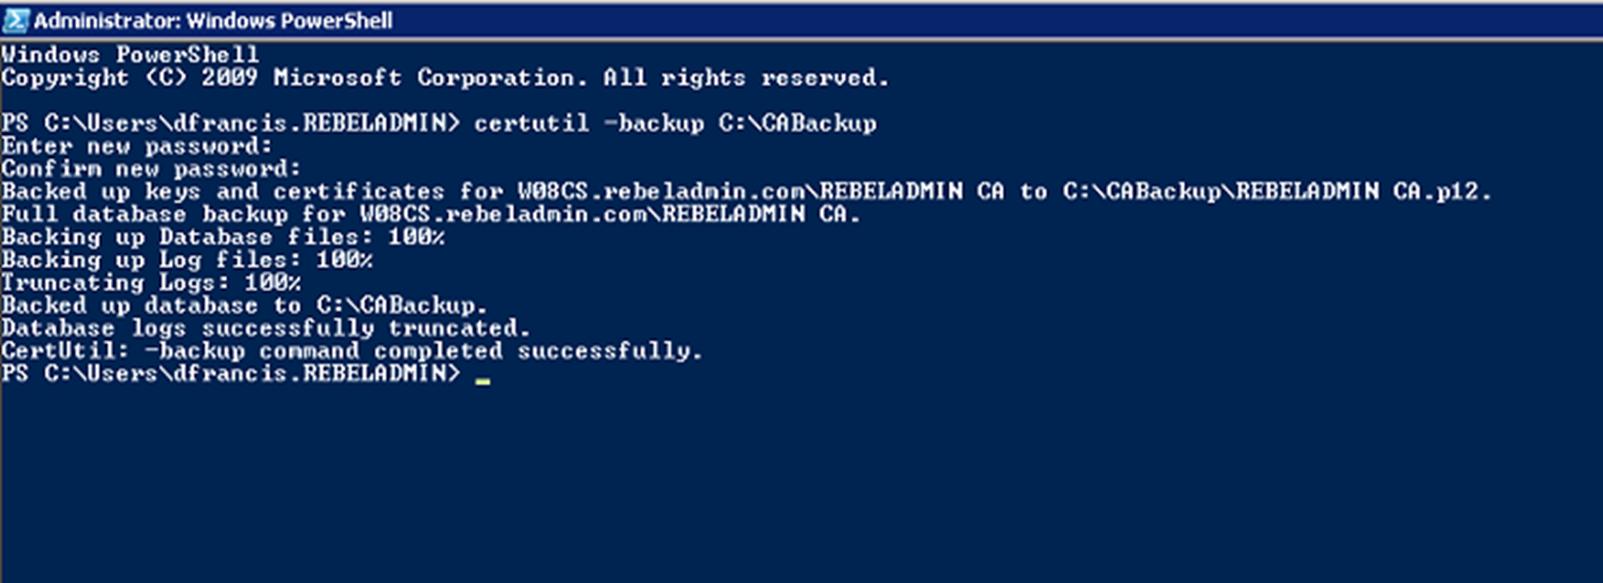 Windows Server 2008 R2 CA Backup